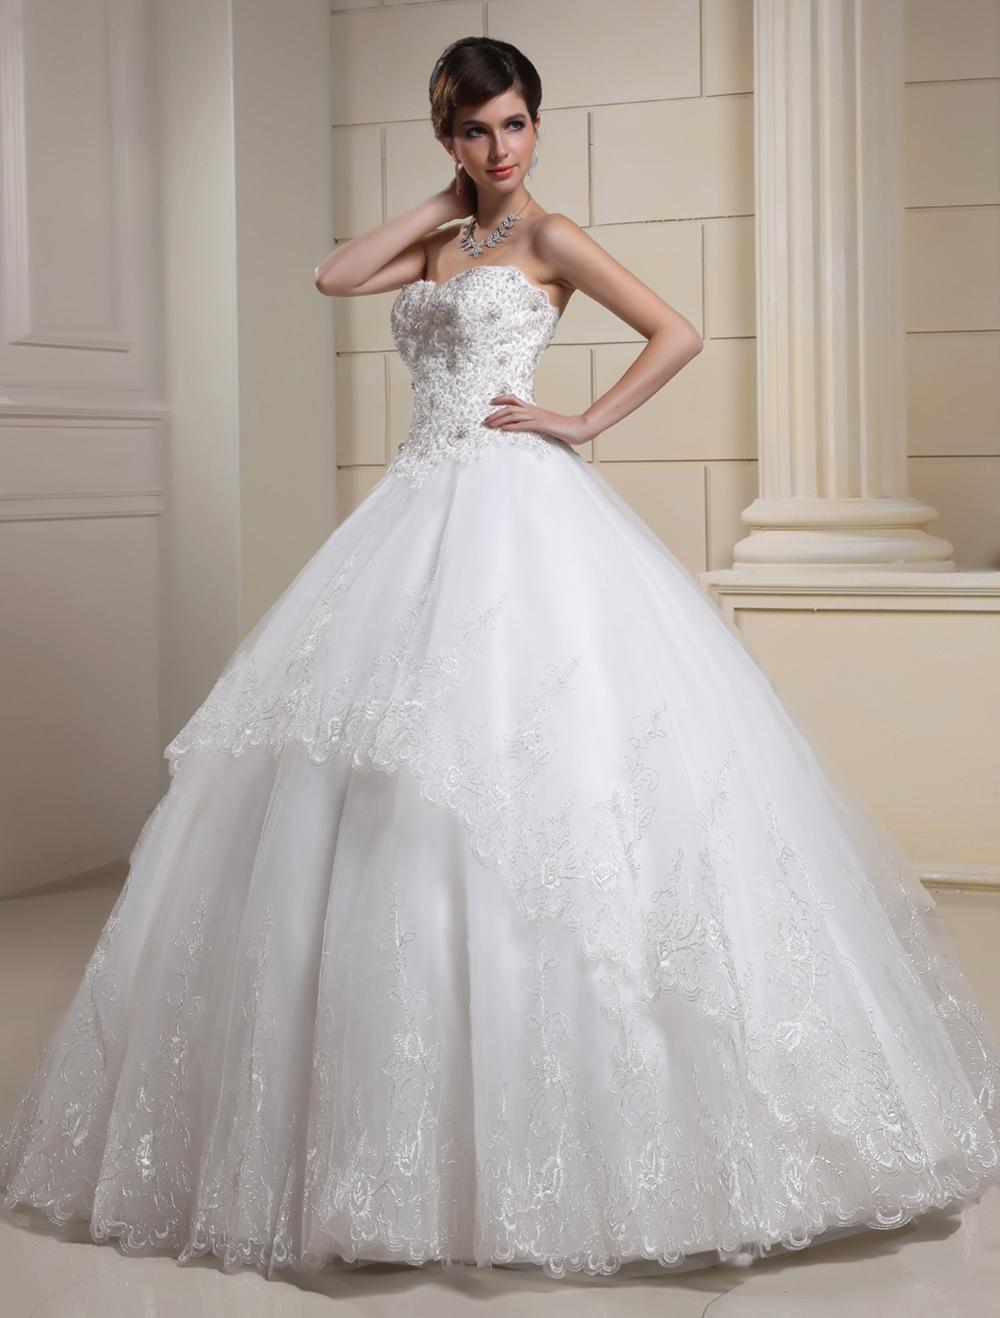 Sweetheart Beading Tulle Wedding Dress For Bride